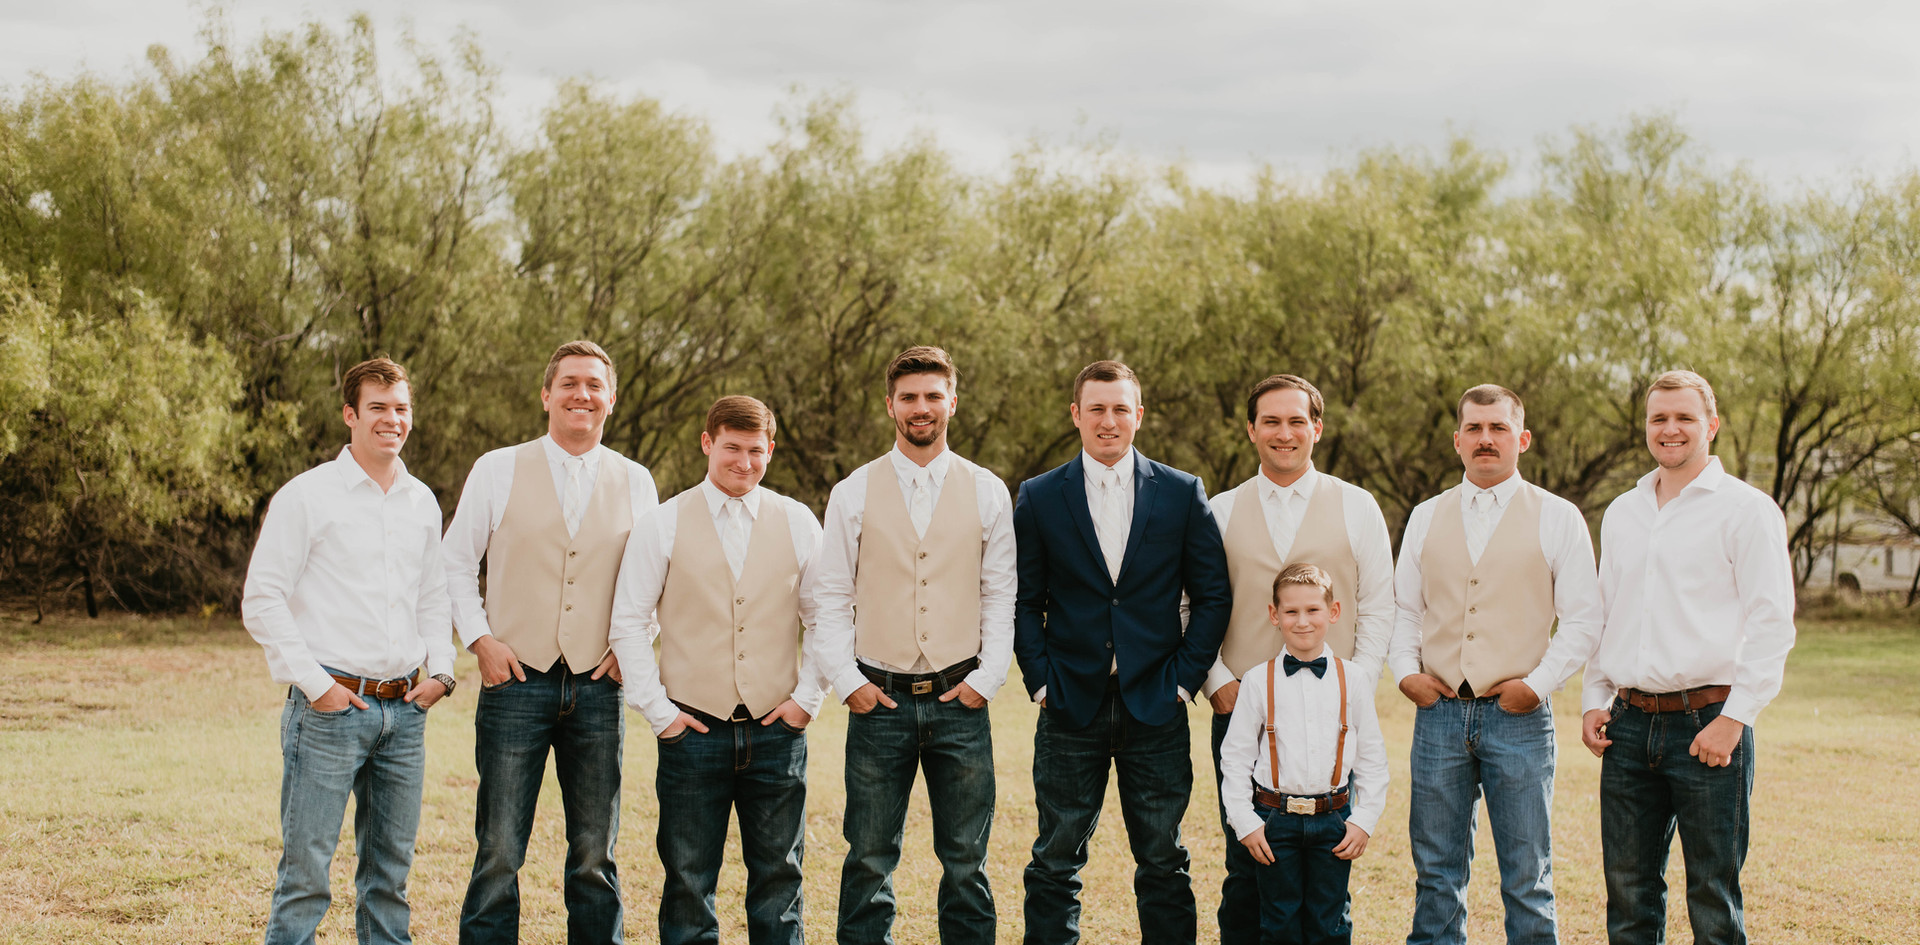 Hadderton Wedding (16 of 19).jpg